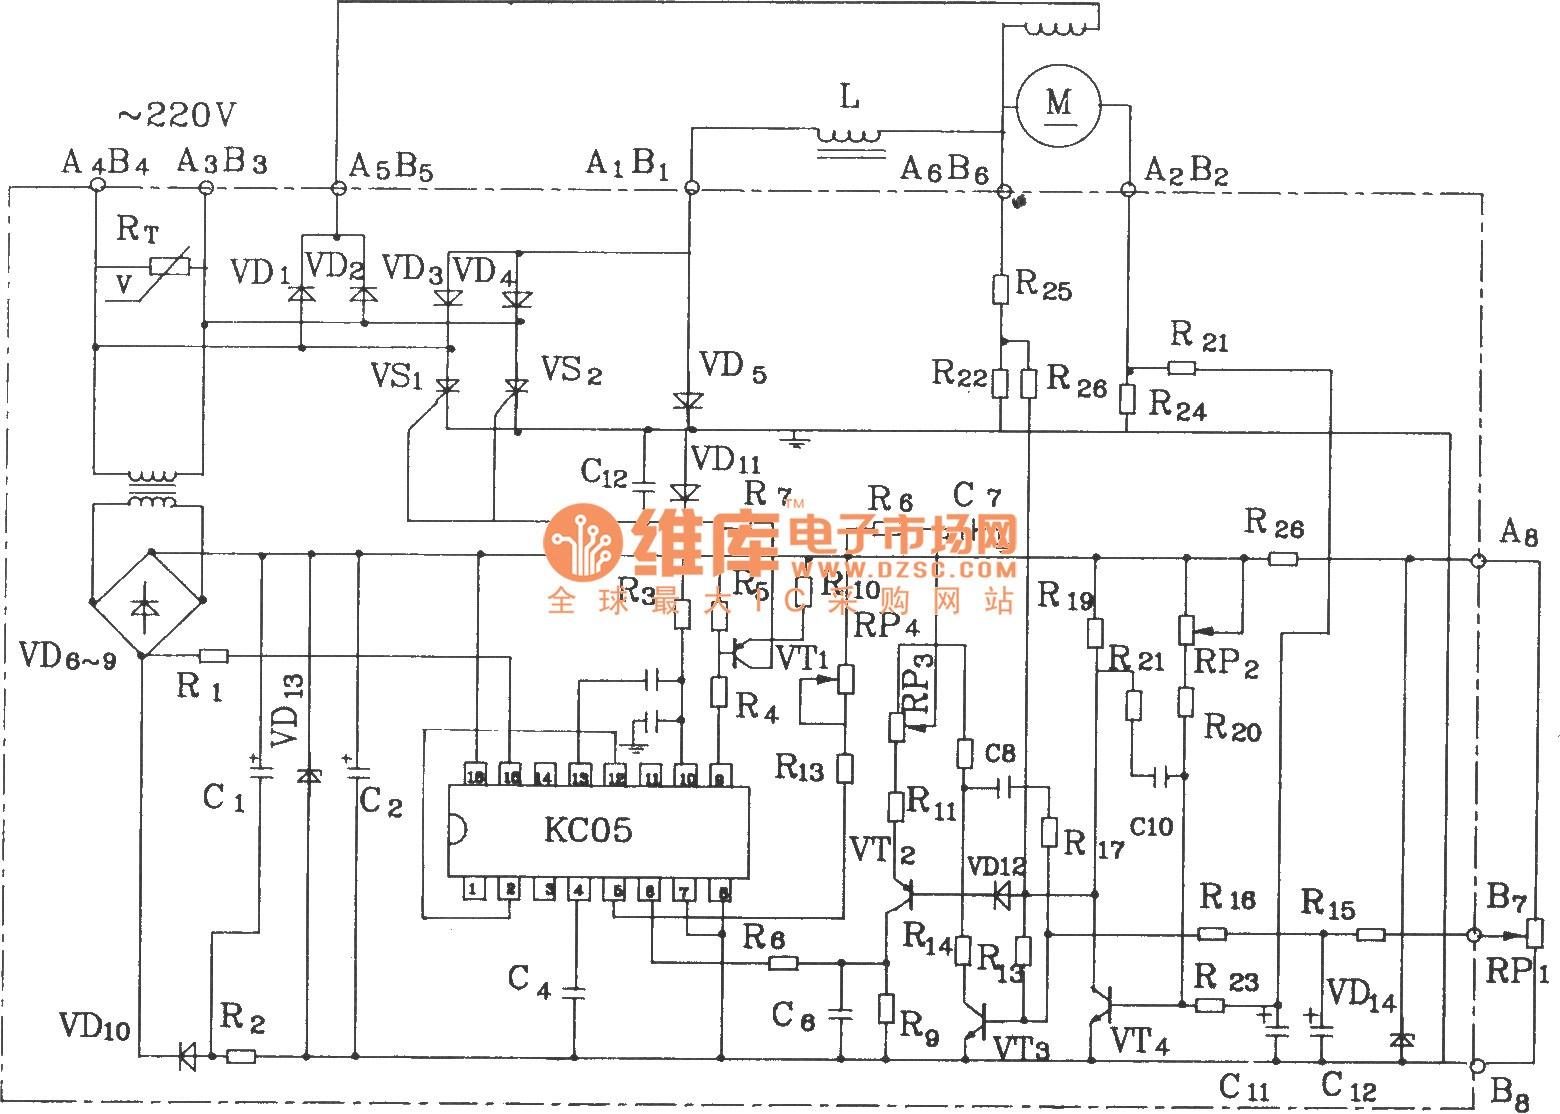 Stupendous Ge 7700 Mcc Wiring Diagram Gallery Wiring Cloud Biosomenaidewilluminateatxorg